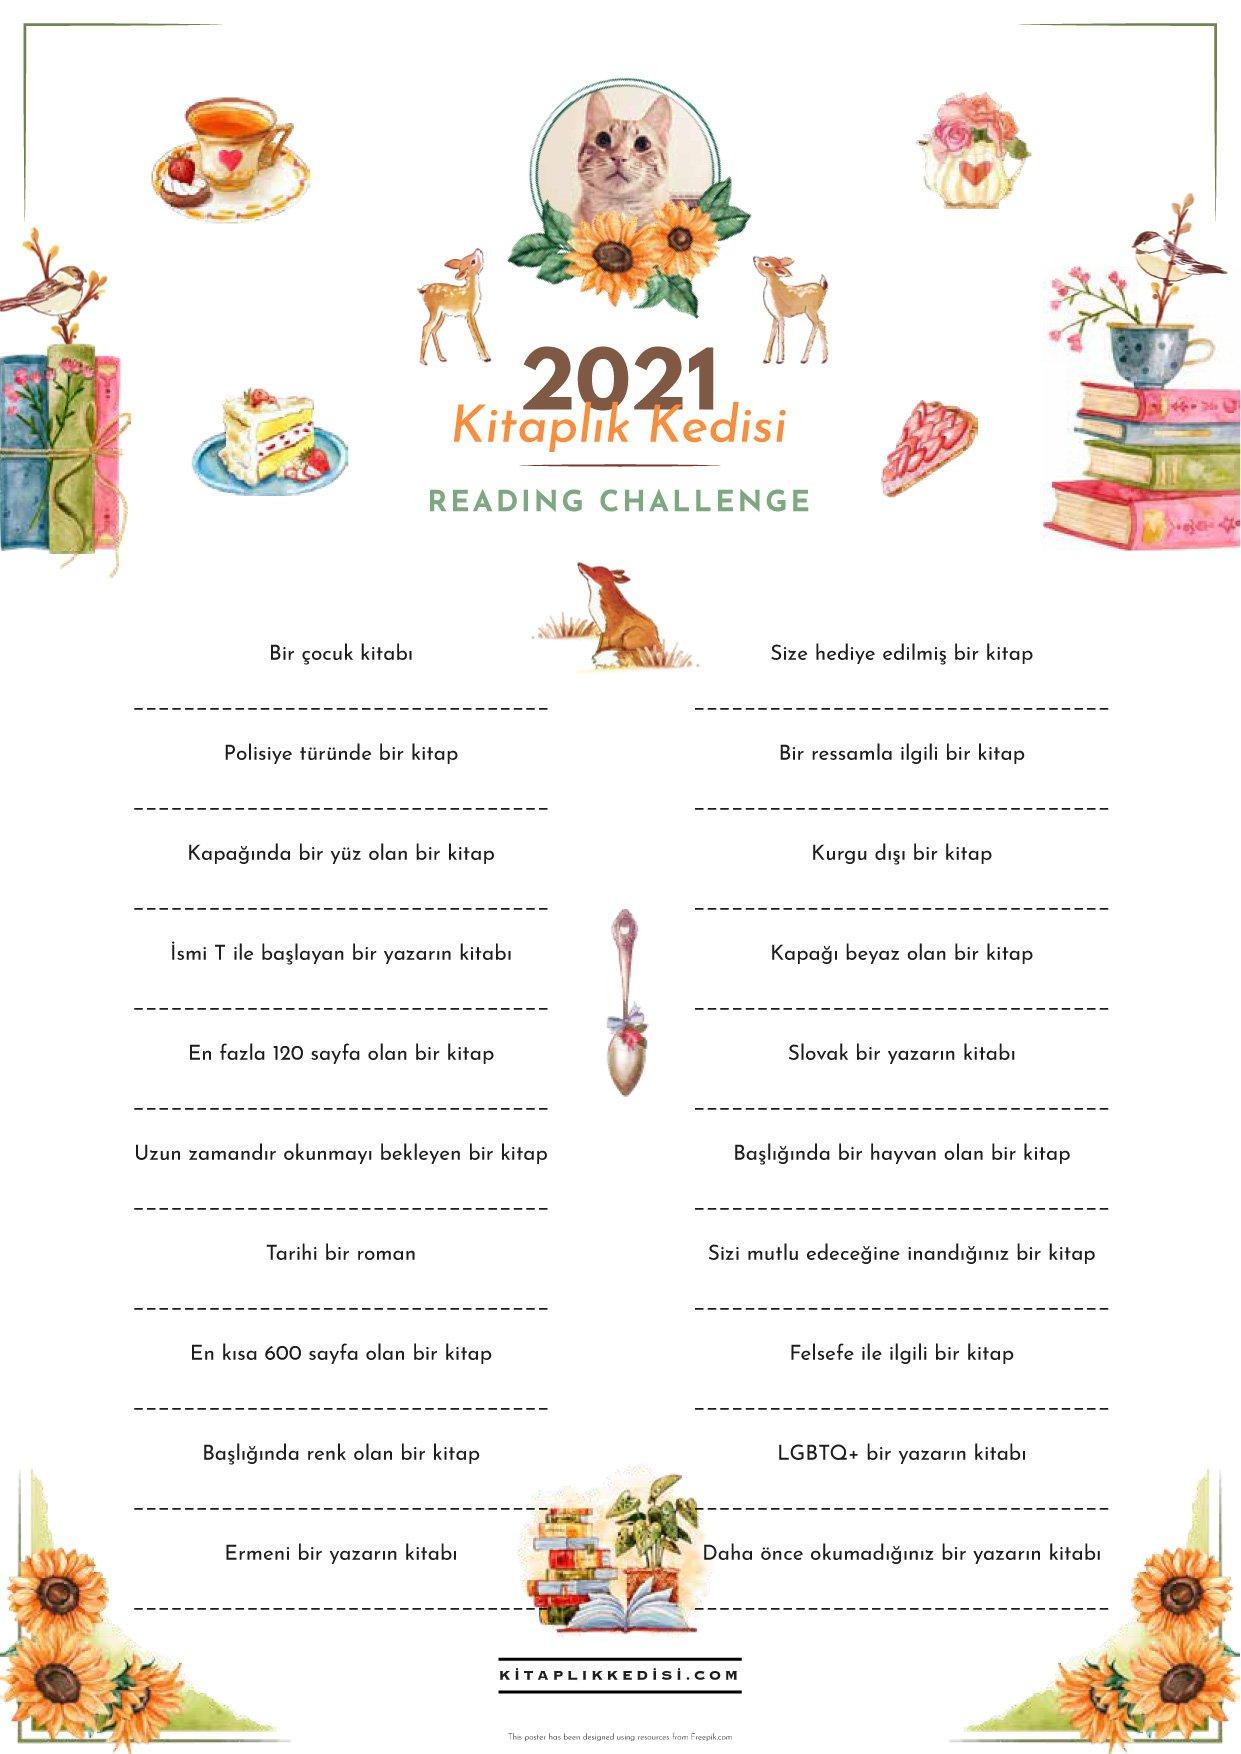 Kitaplık Kedisi Reading Challenge 2021!